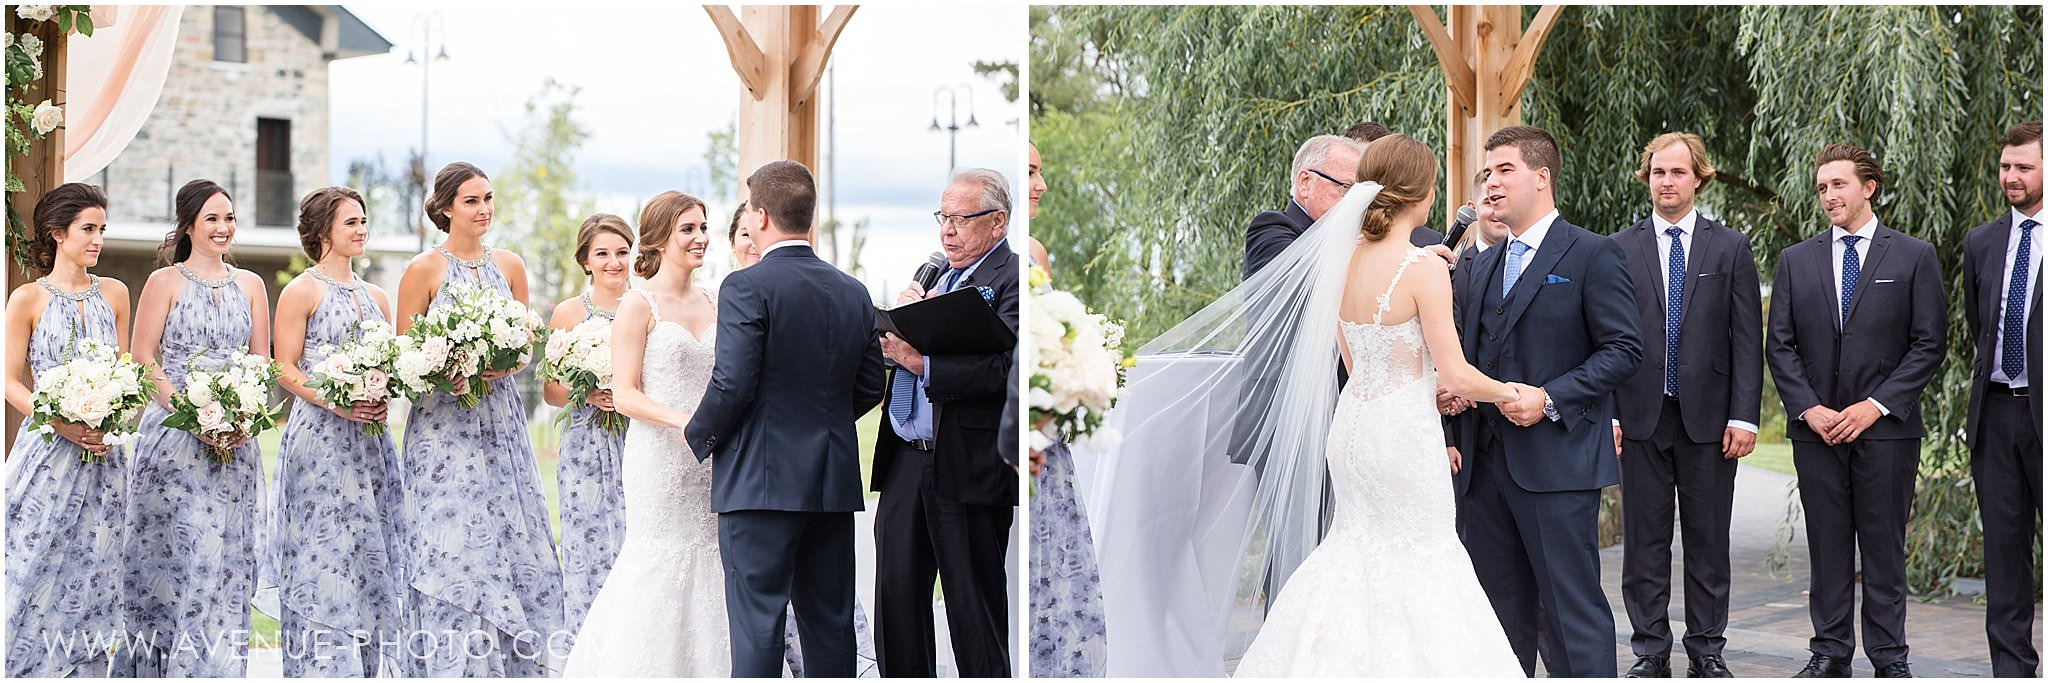 The Arlington Estate Wedding Photos - Kleinburg Wedding Photography, Outdoor Ceremony